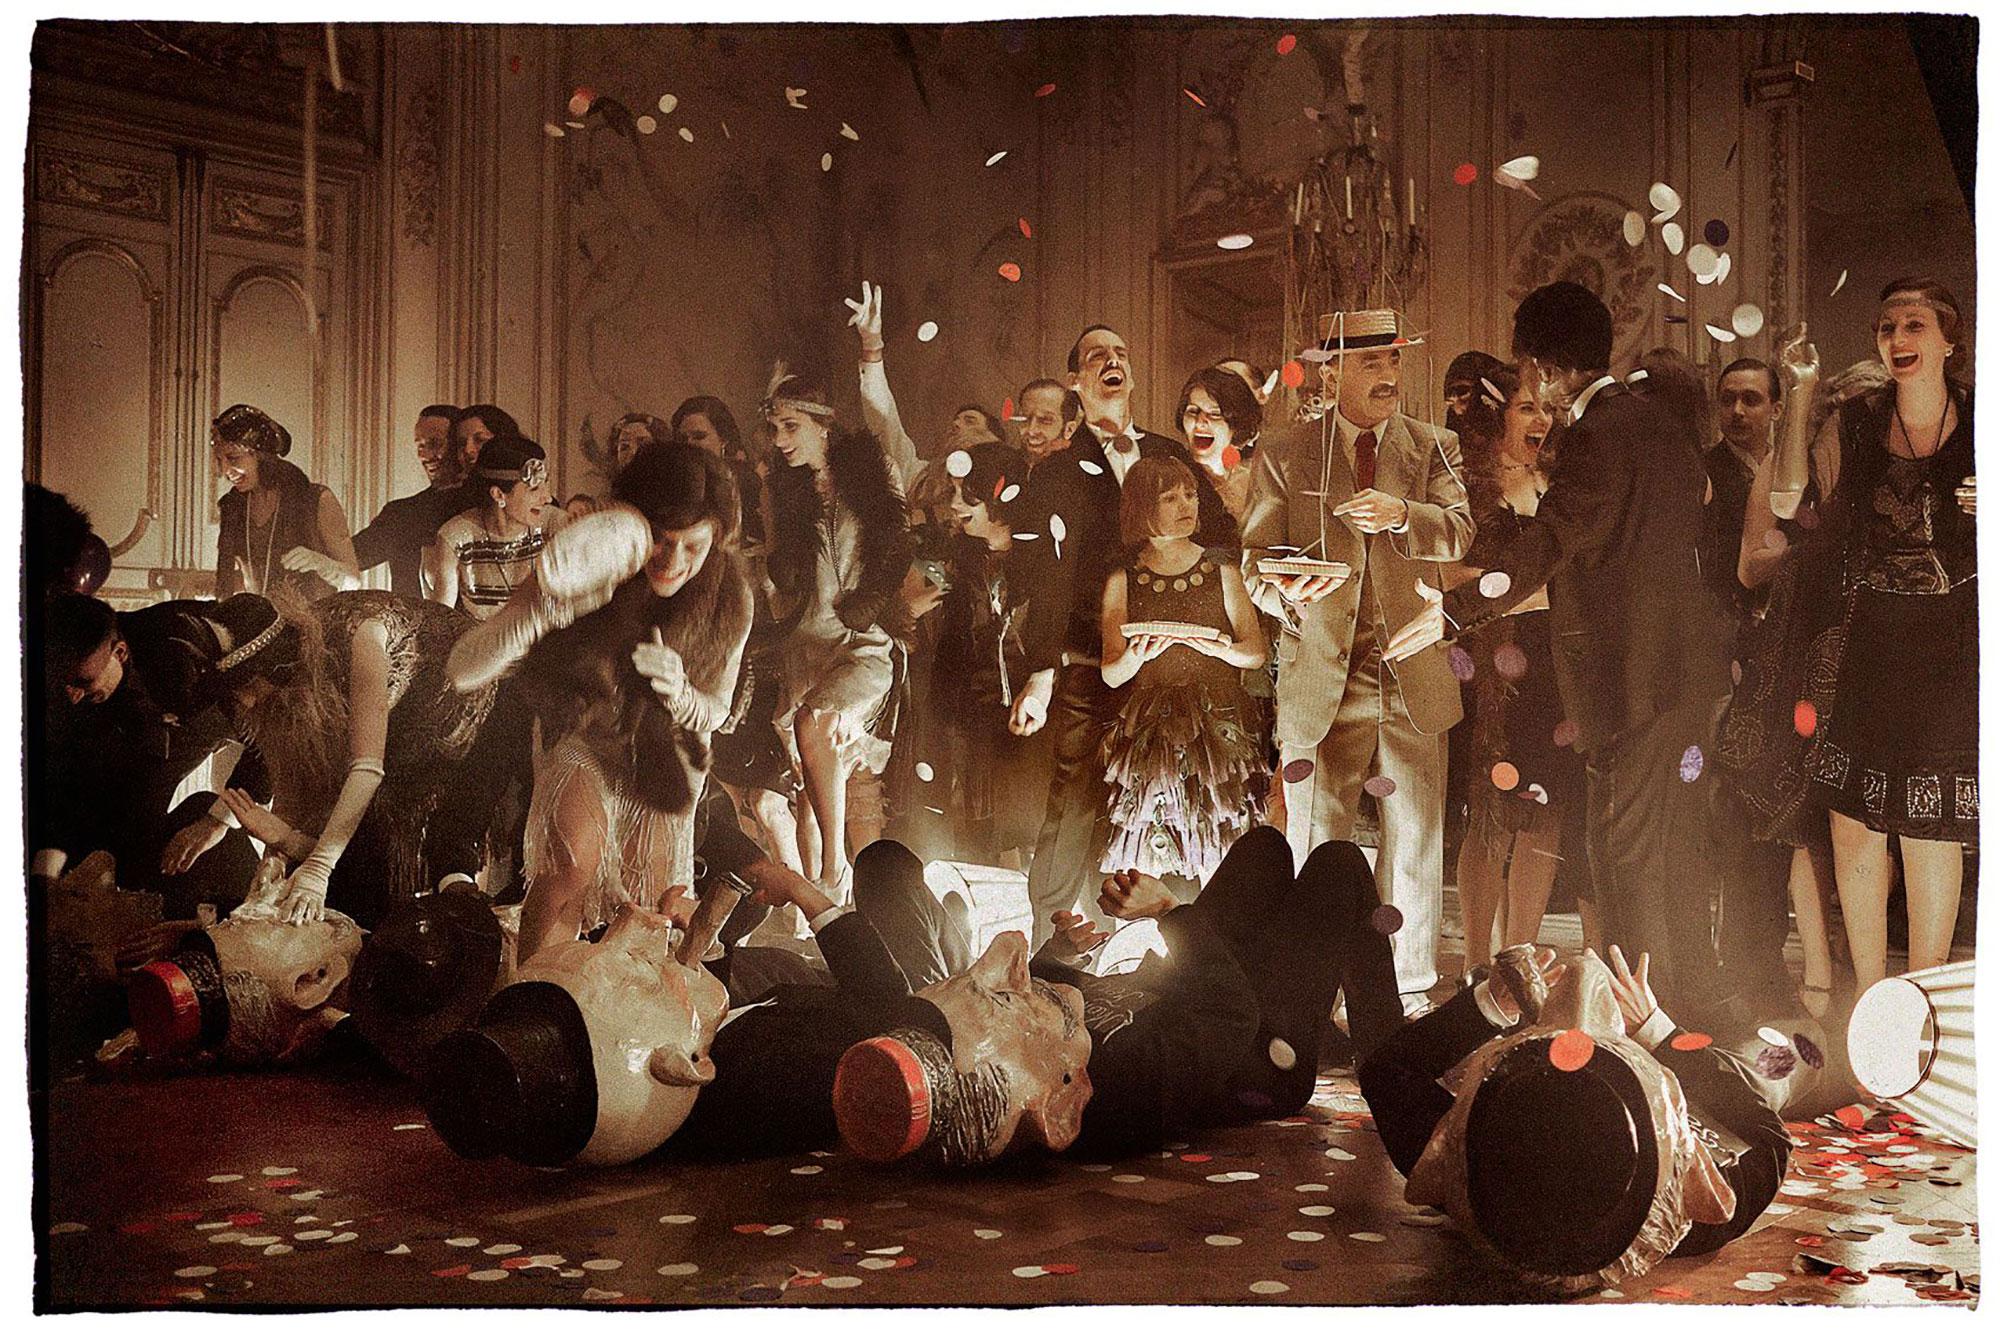 ©︎2017 STADENN PROD. – MANCHESTER FILMS – GAUMONT – France 2 CINEMA (C)Jerome Prebois / ADCB Films